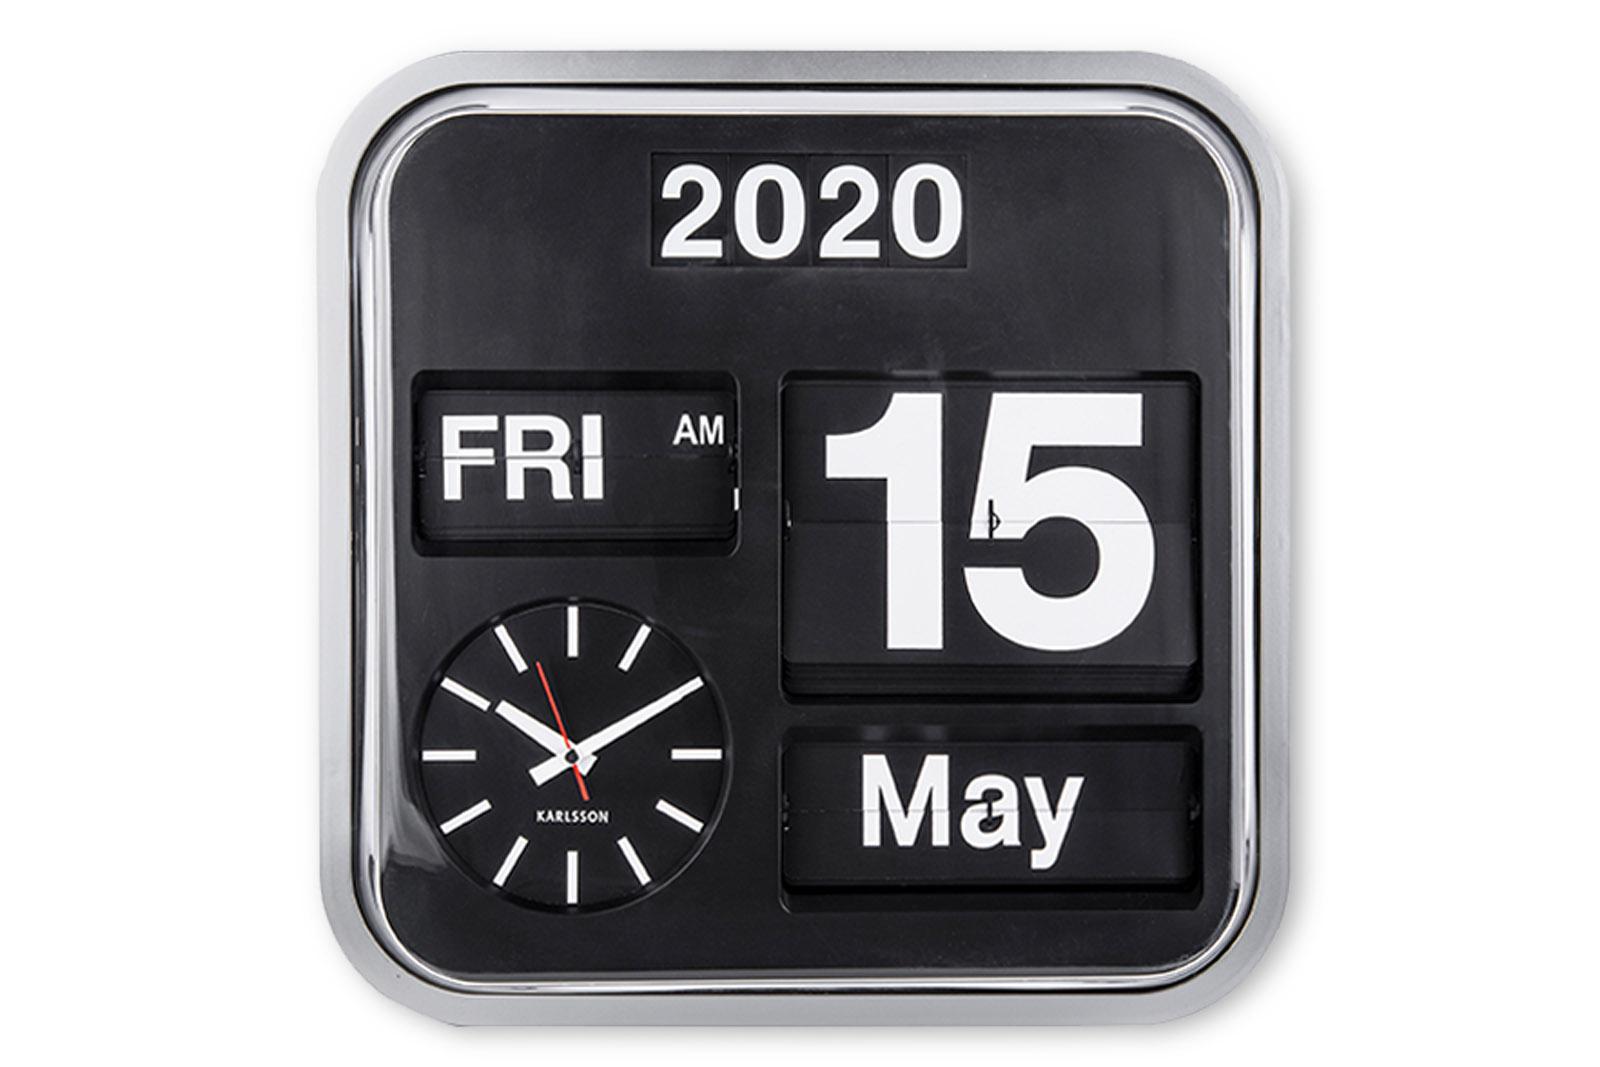 KARLSSONカールソン 掛け時計 ウォールクロック Big Flip パタパタ時計 フリップクロック ホワイト 北欧 オランダ カールソン カレンダー おしゃれ インテリア リビング雑貨 モノトーン シンプル デザイナーズ モノクロ オンライン限定商品 デザイン時計 再入荷/予約販売! KARLSSON